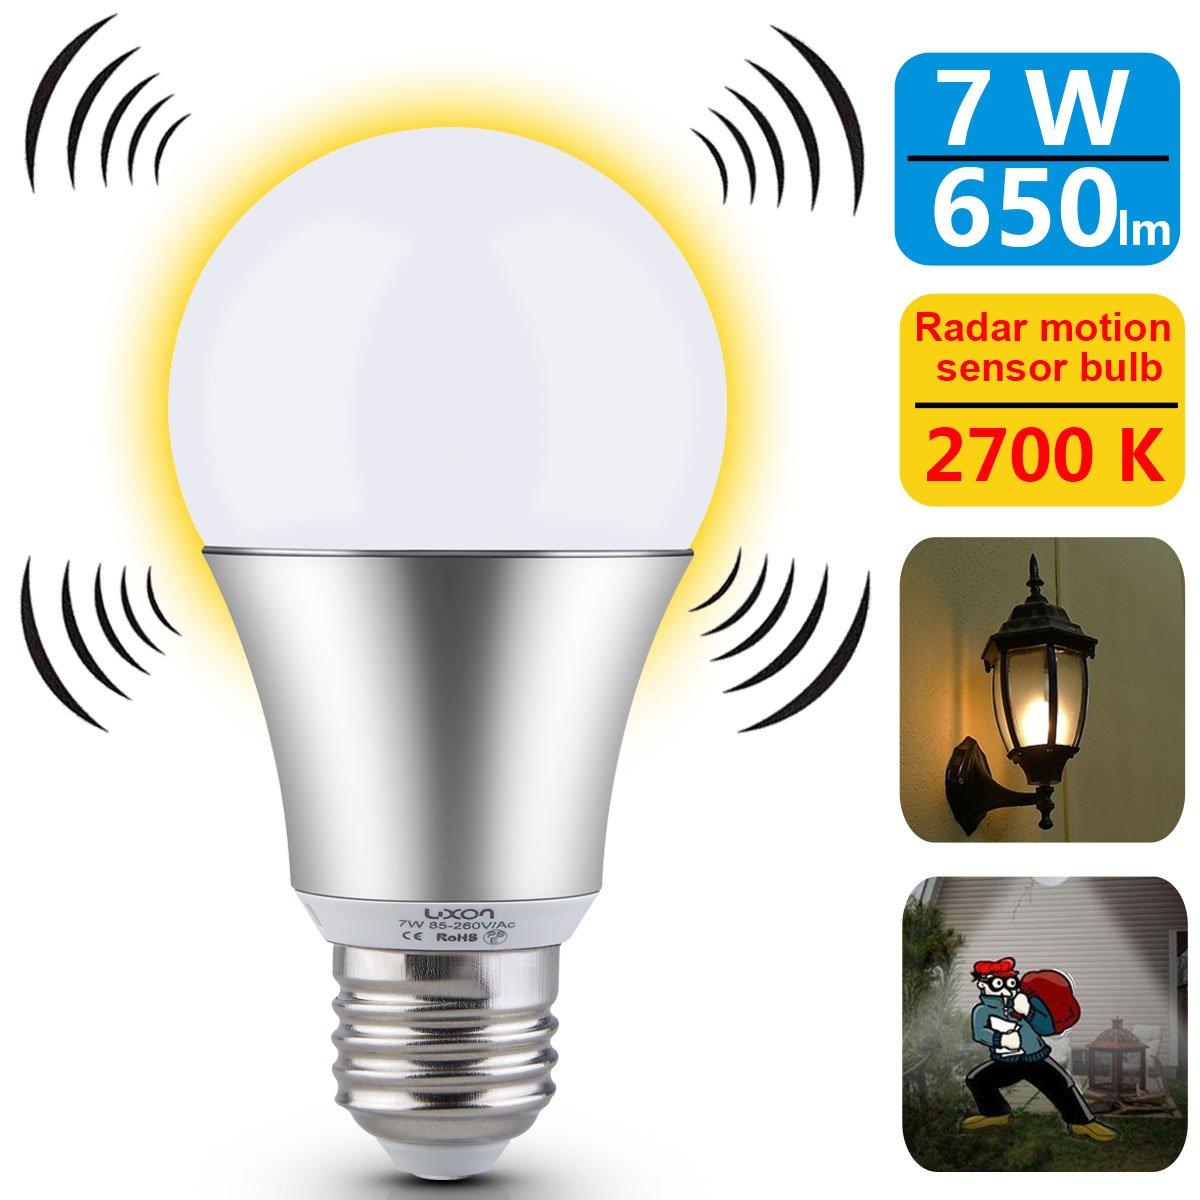 Cheap Motion Sensor Diagram Find Deals On Apc Probe Wiring Luxon Light Bulb 7w Smart Radar Dusk To Dawn Led